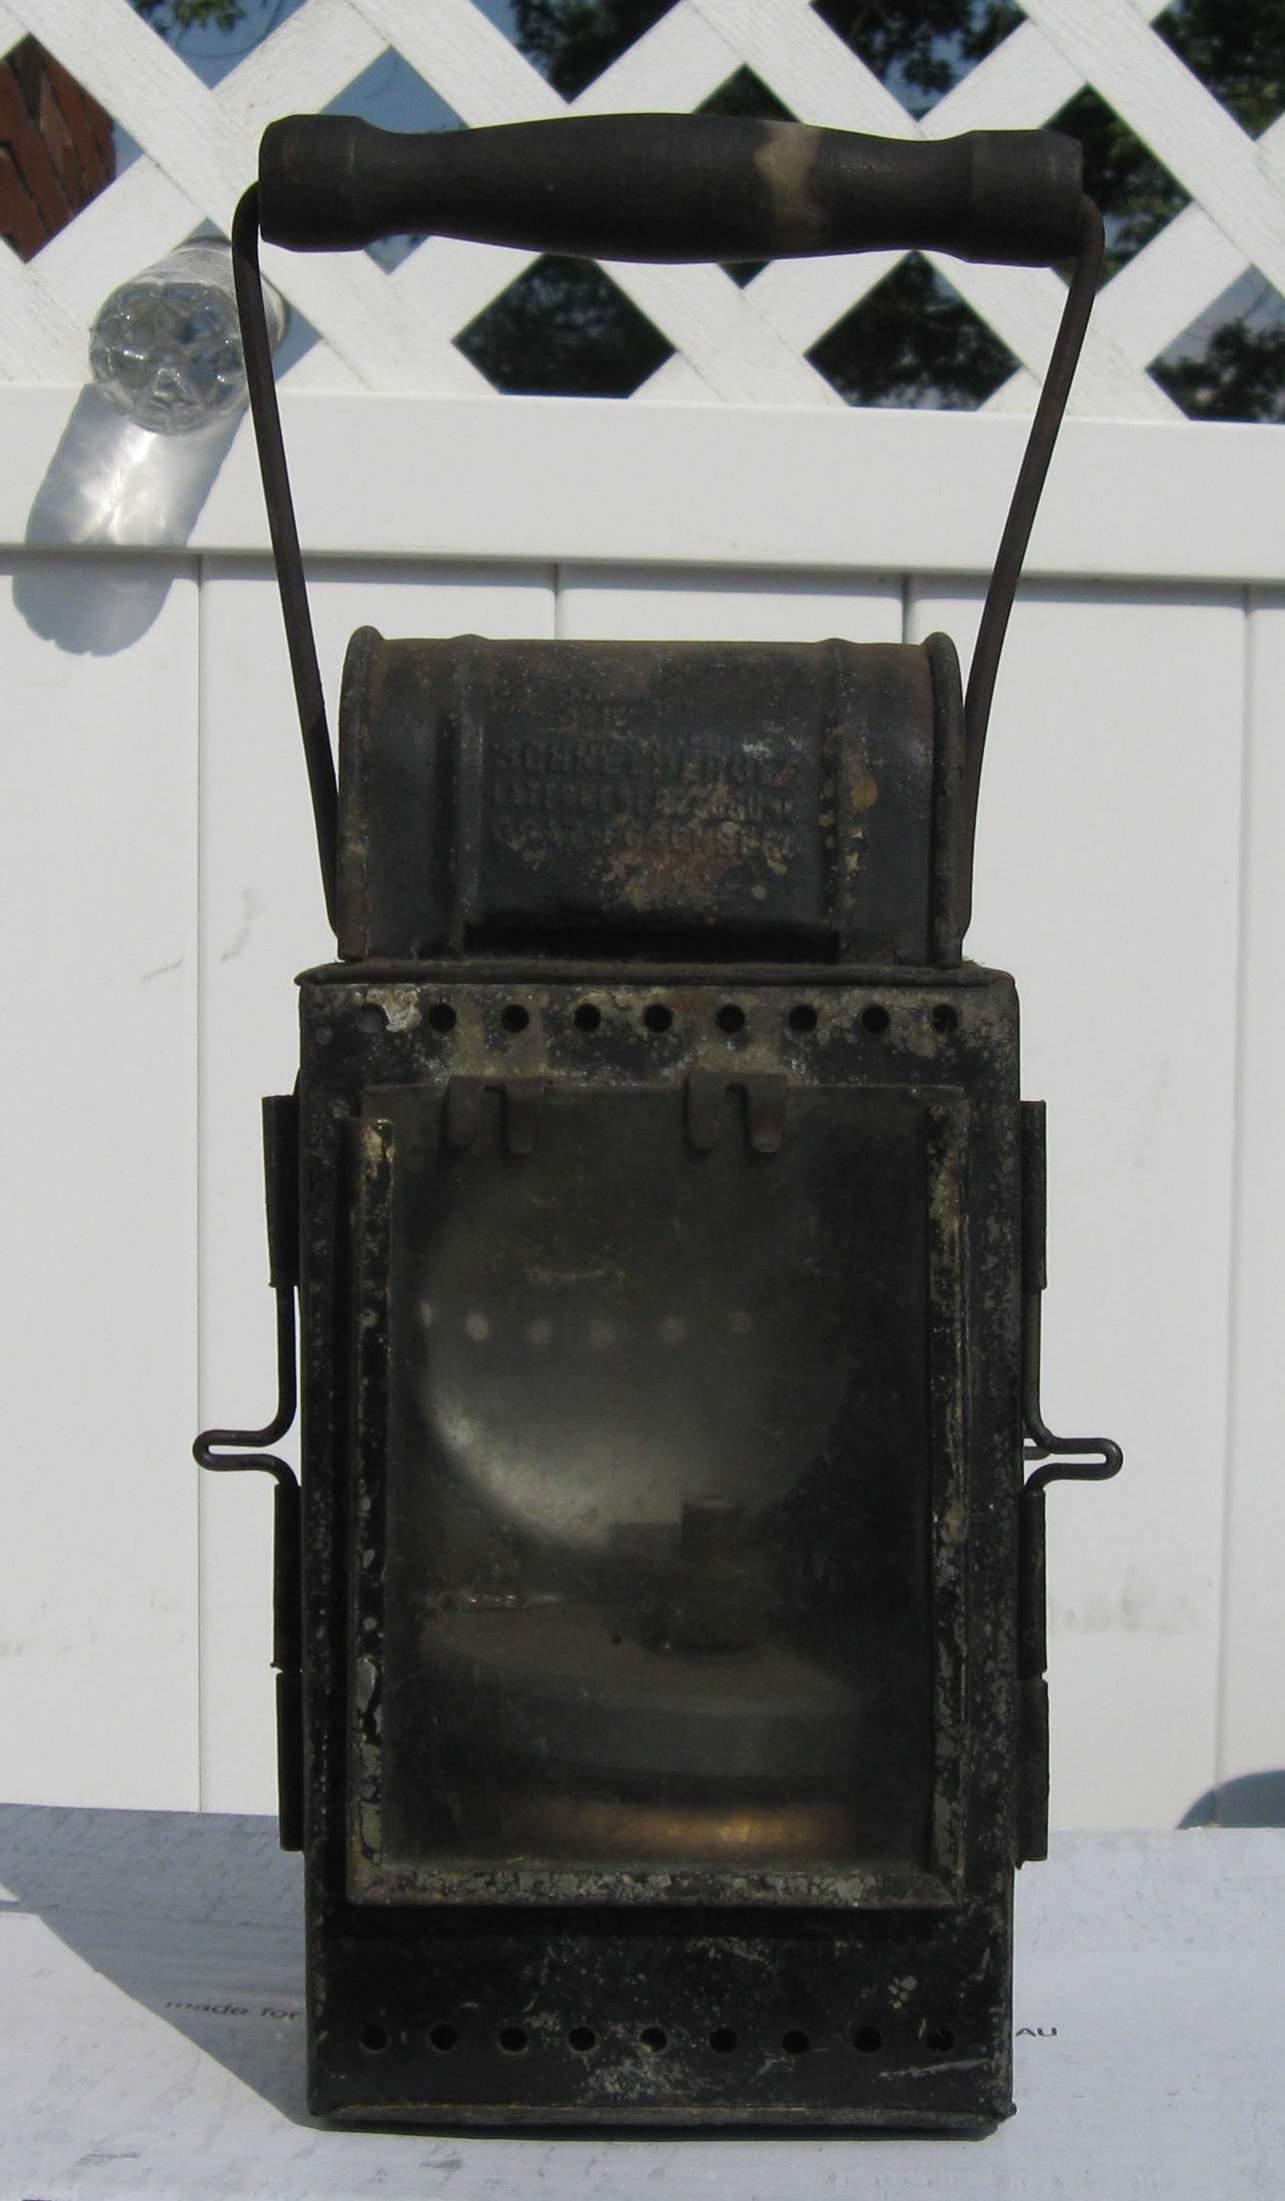 Your opinion on this WW2 German Carbide Railroad Lantern